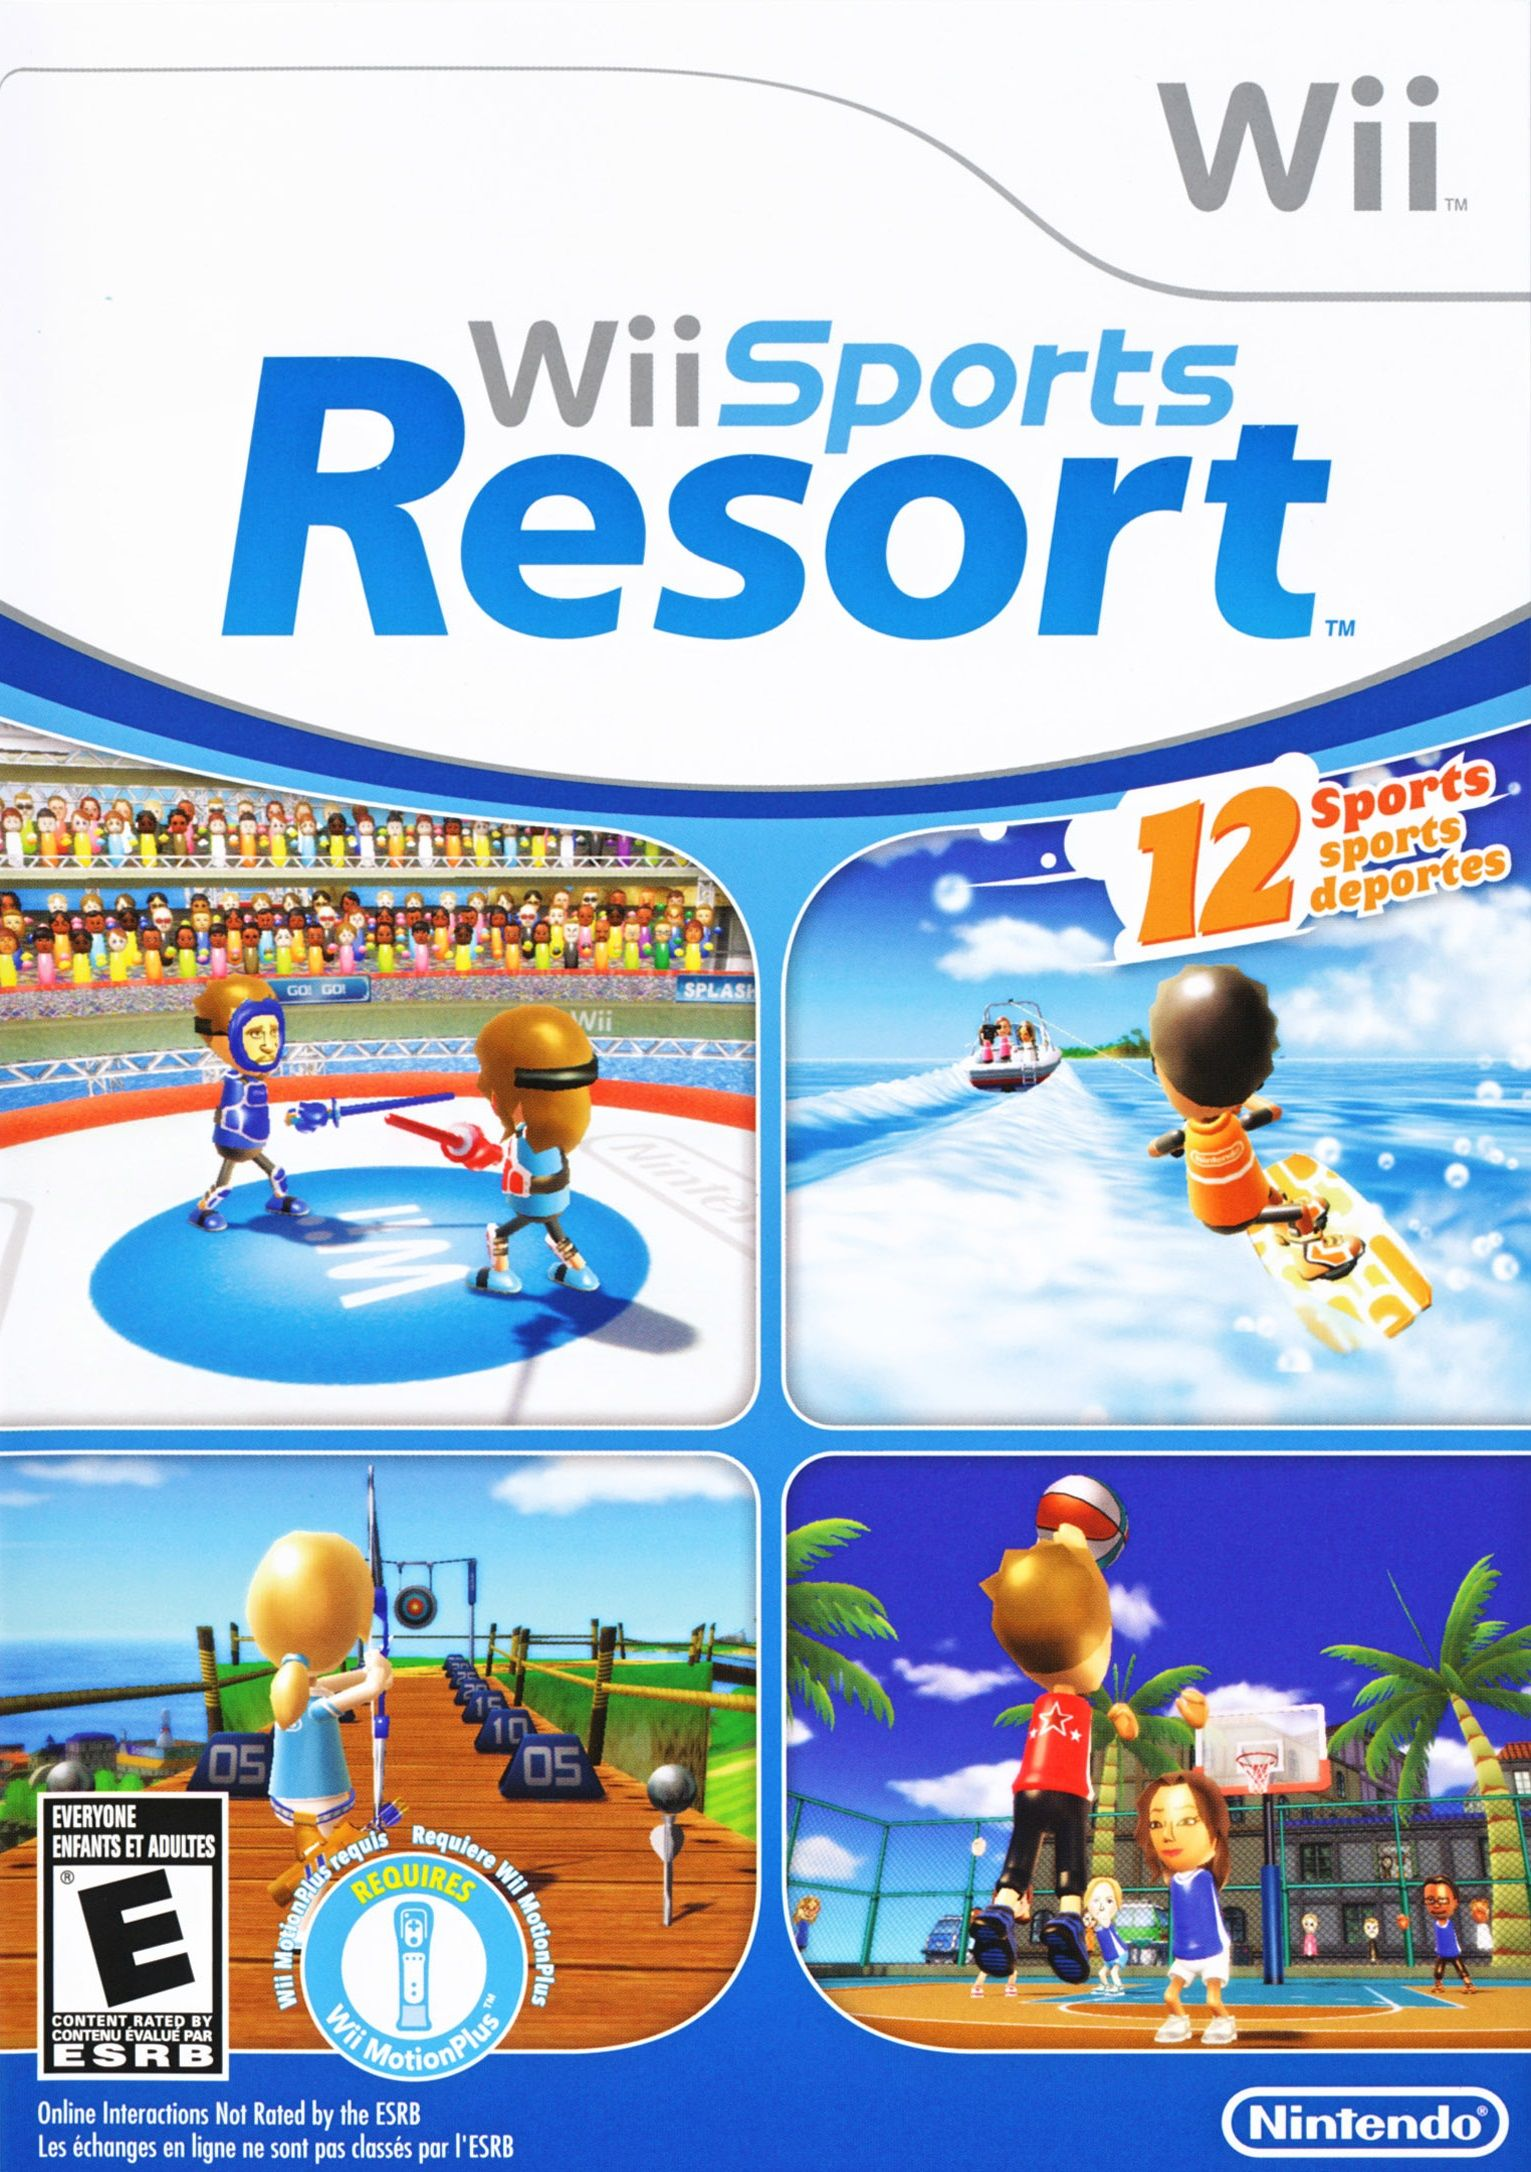 Wii Sports Resort Nintendo Wii Game Wii Sports Resort Wii Sports Wii Games